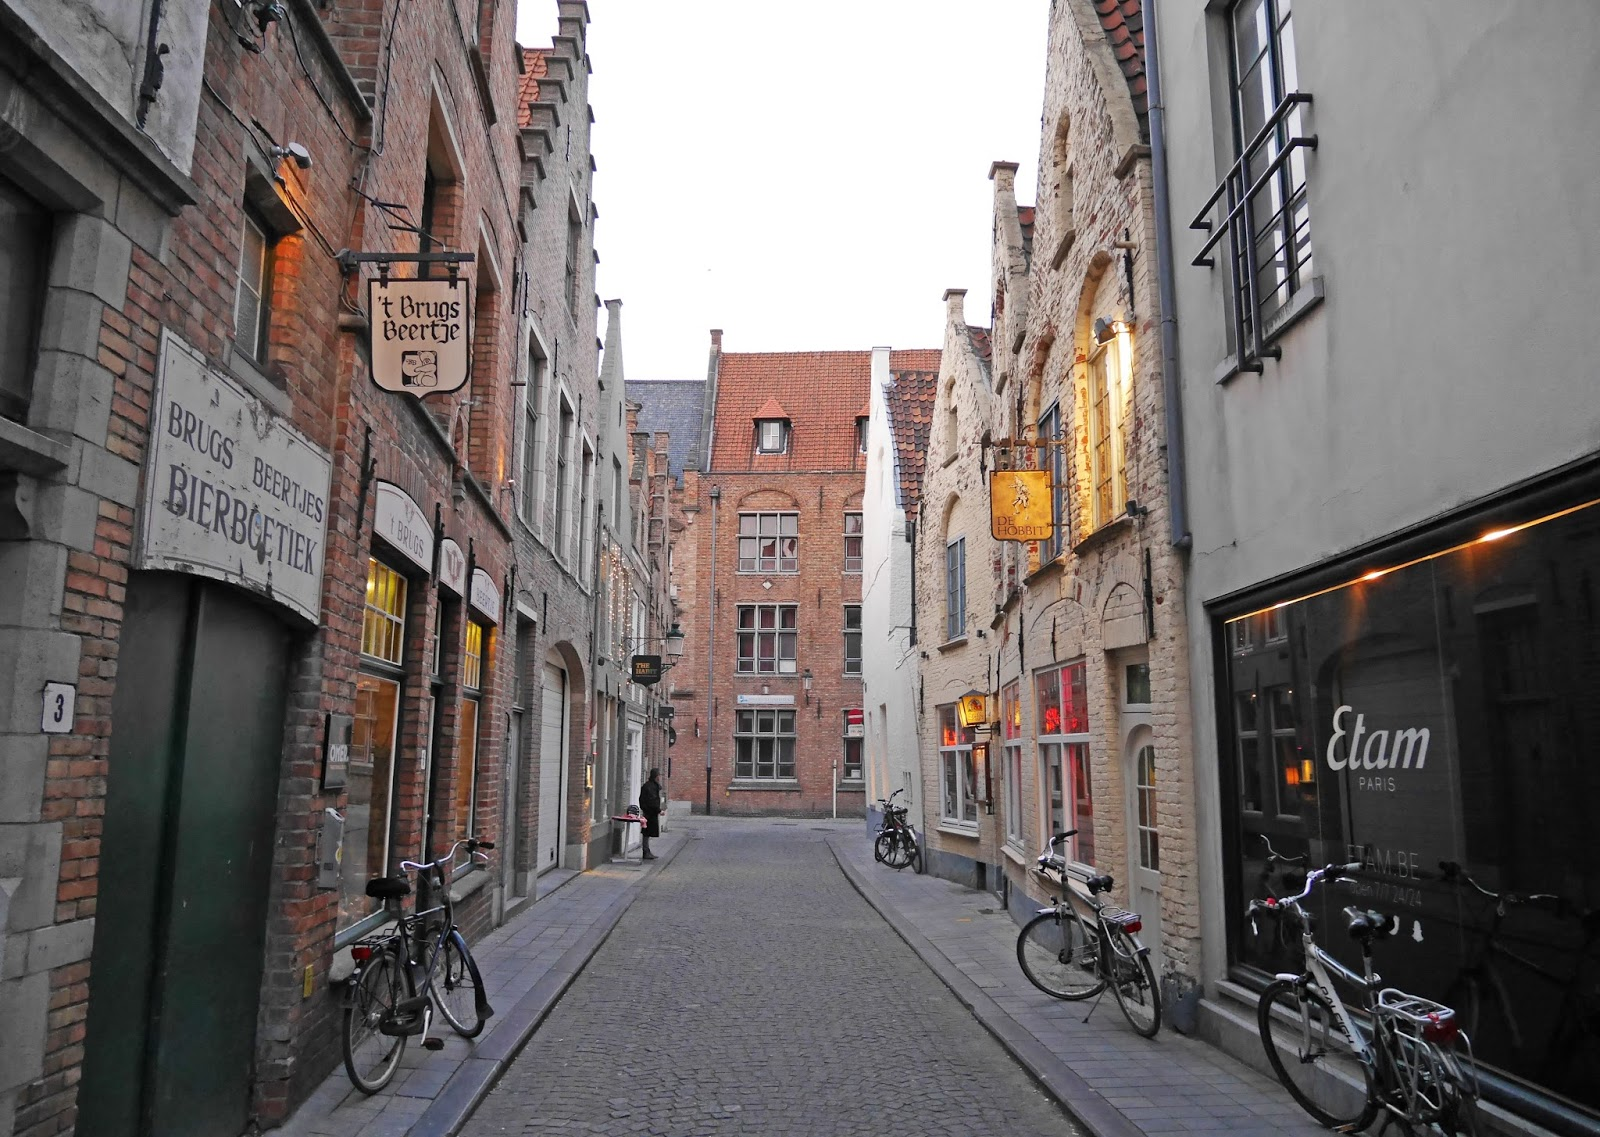 Bruges city centre streets